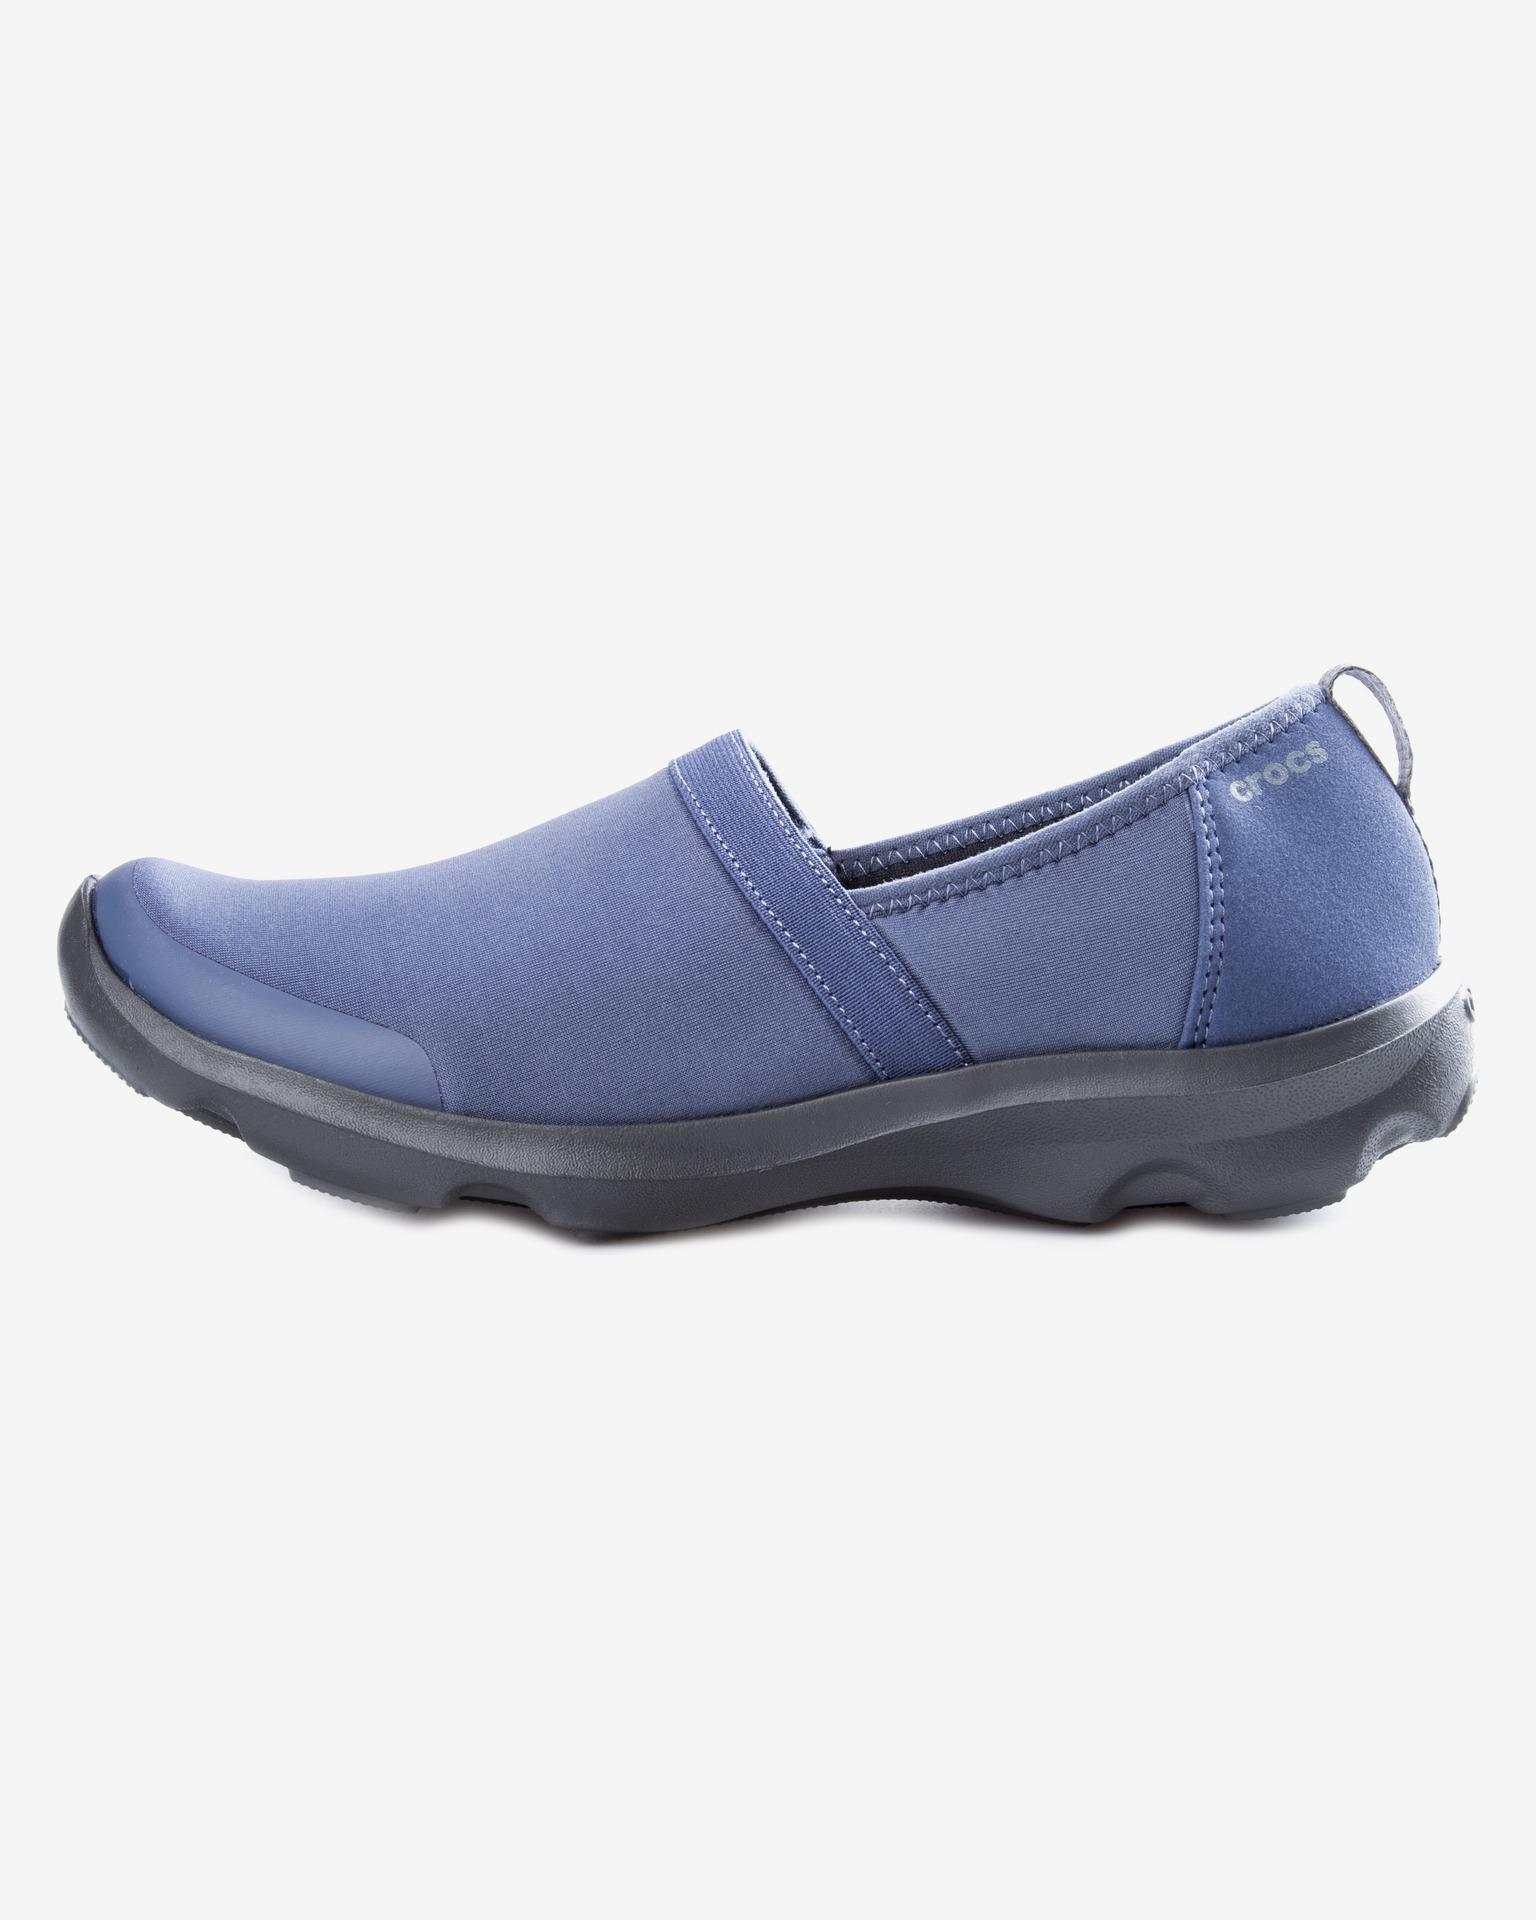 CROCS Slipper DUET BUSY DAY 2.0 Satya A-line bijou blue